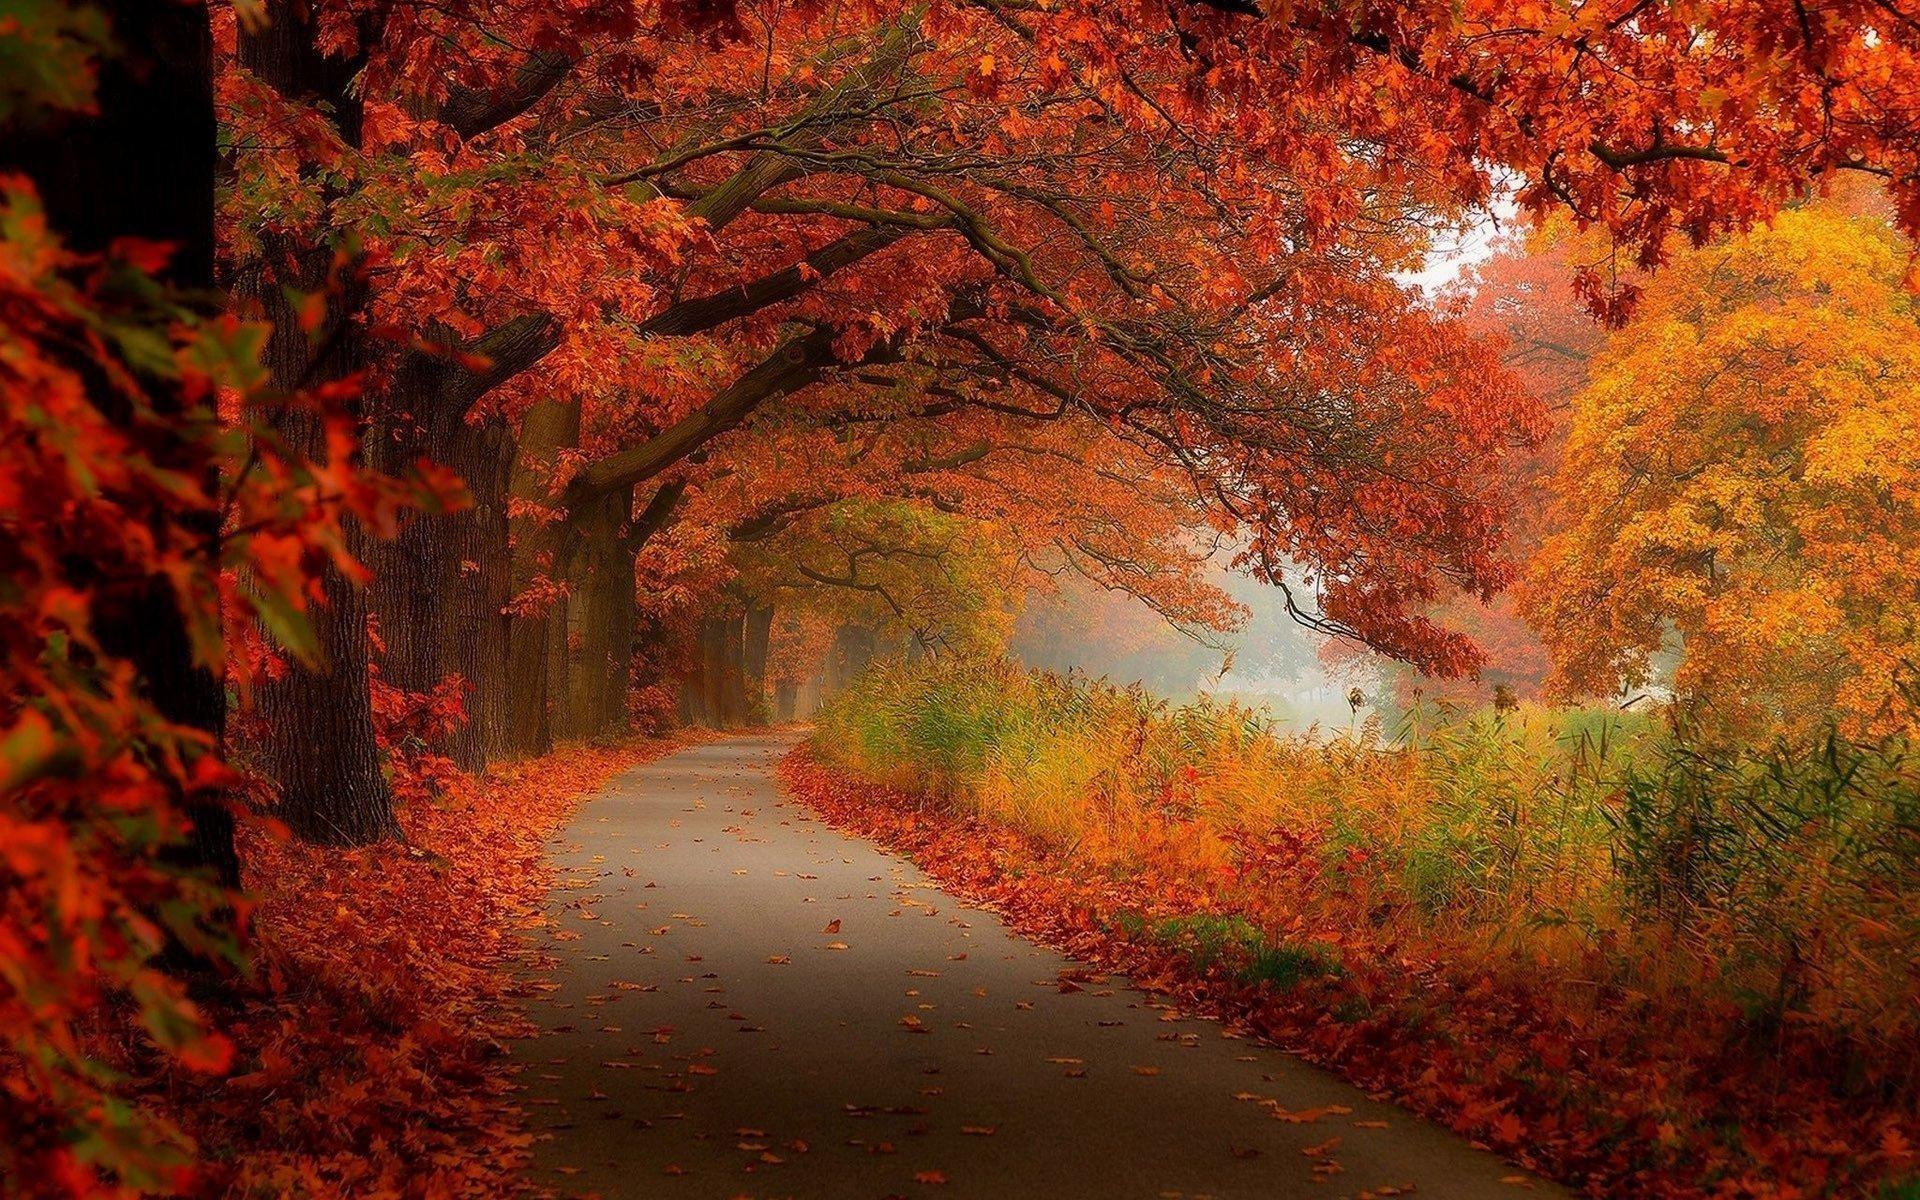 Fall Leaves Falling Wallpaper Fall Scenery Wallpapers 183 ①